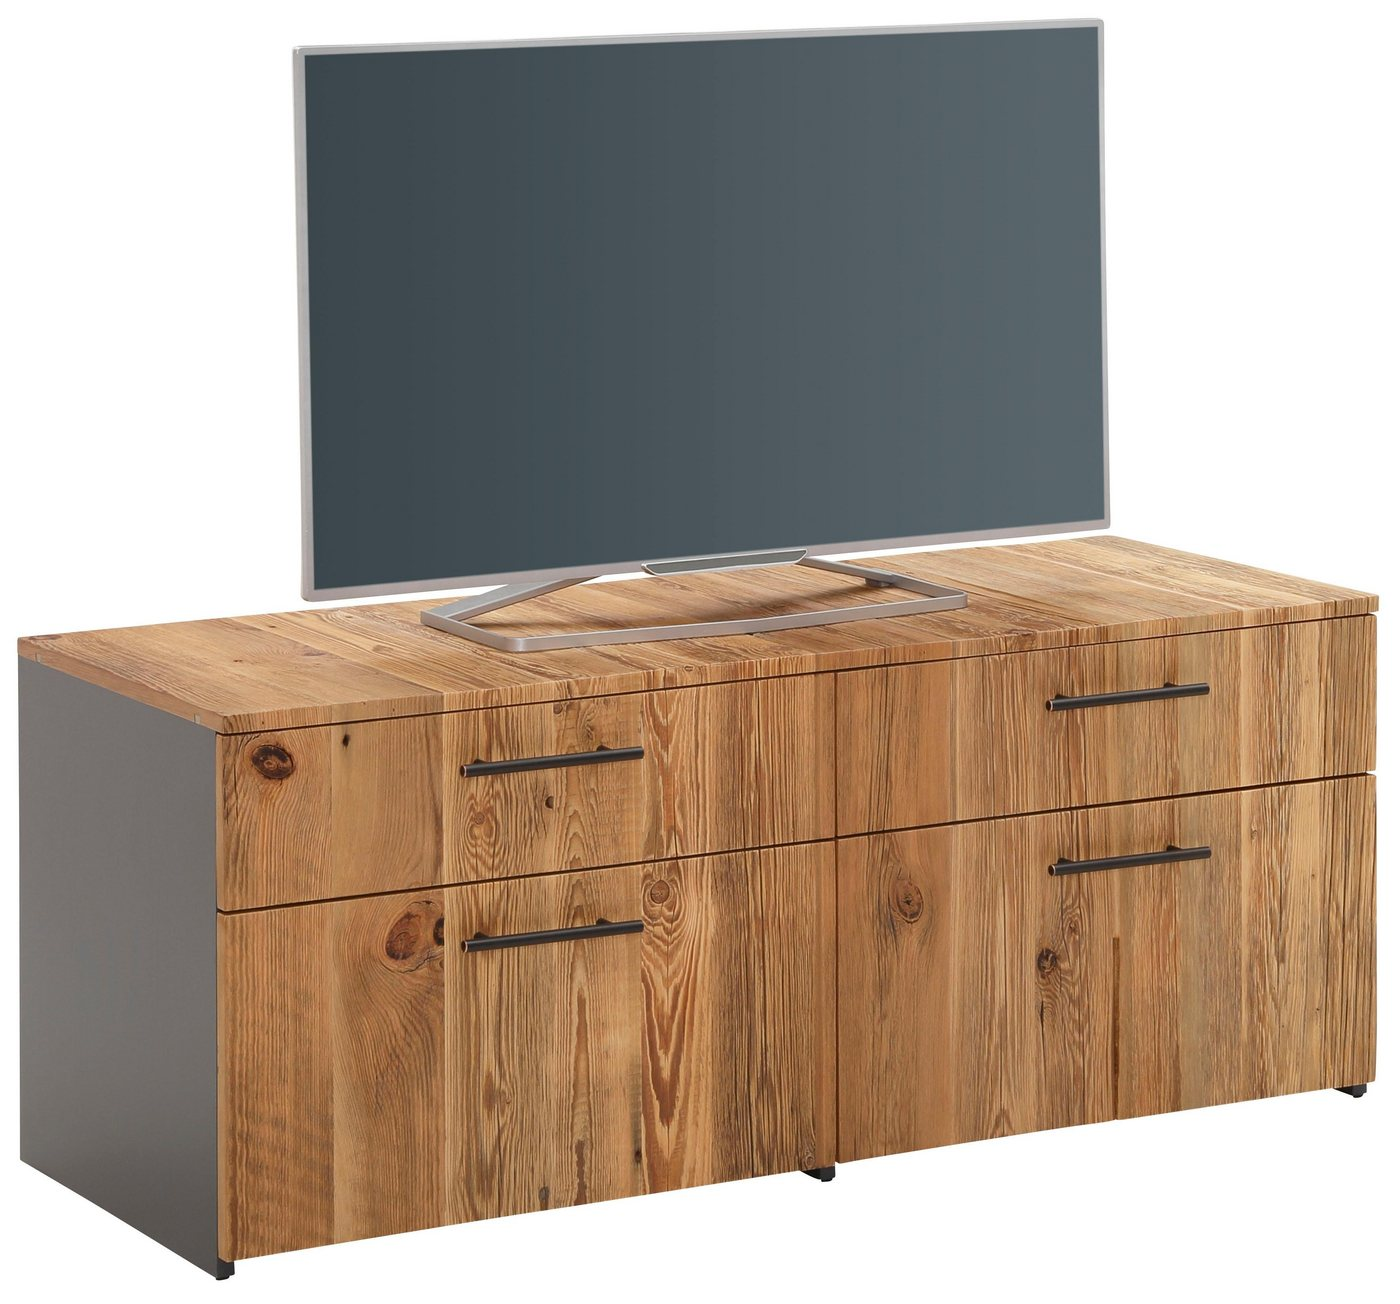 TV Möbel - Premium collection by Home affaire Lowboard »ReLine«, Breite 128 cm  - Onlineshop OTTO